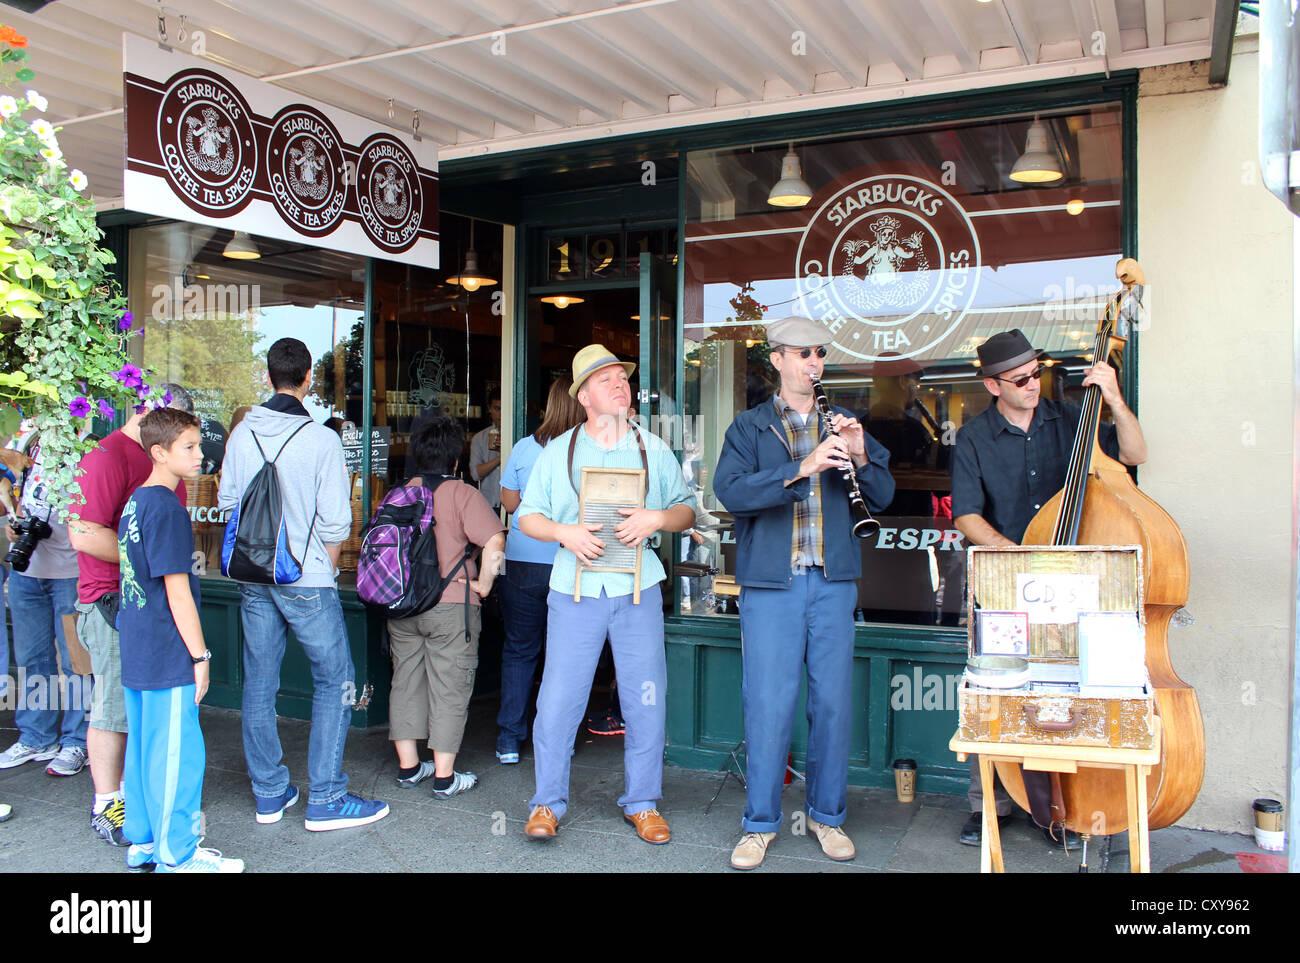 The first Starbucks coffee store, Seattle, Washington, USA - Stock Image